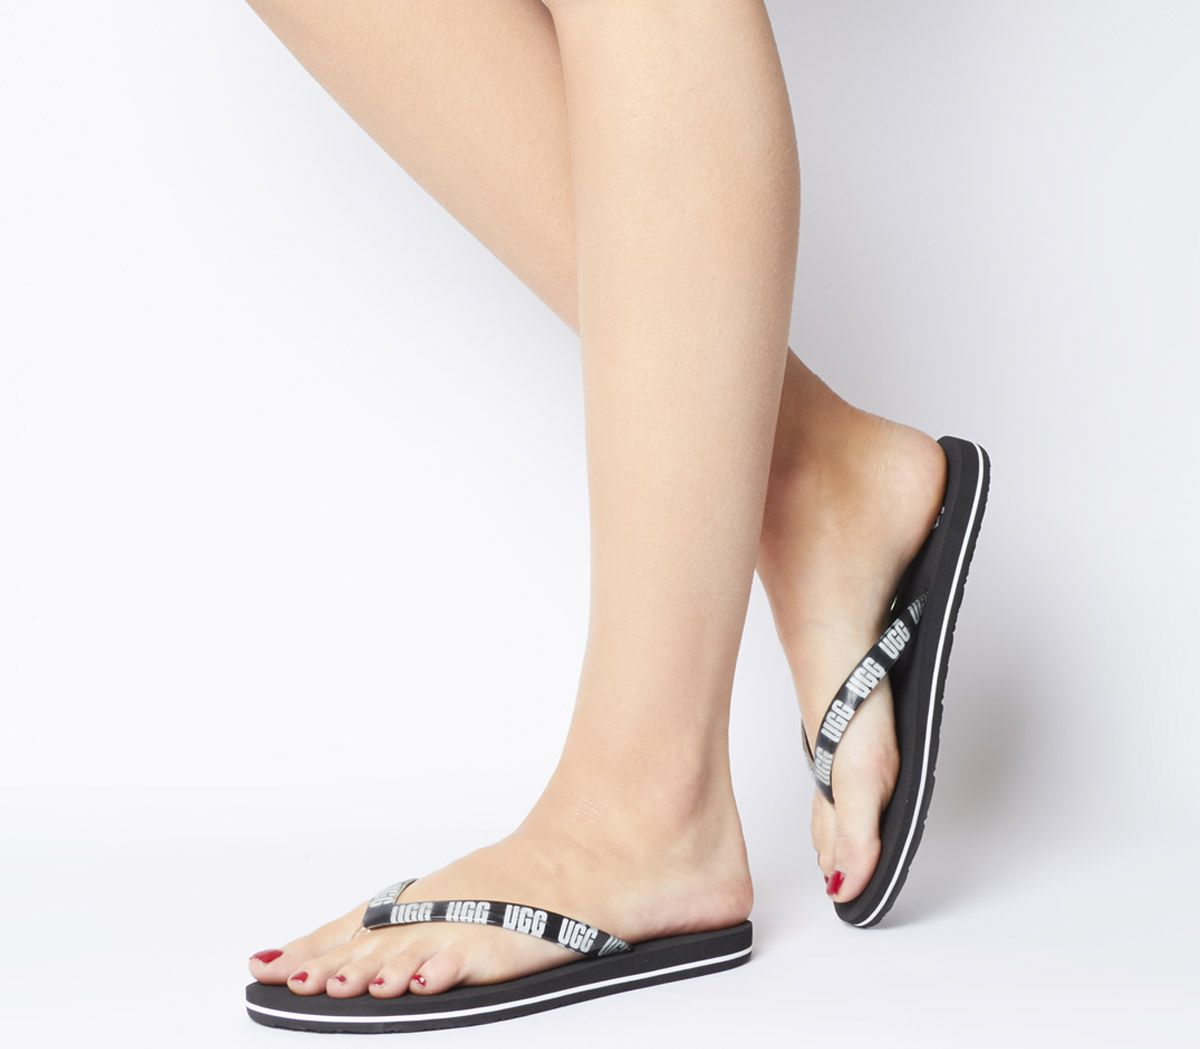 4ecdcabd9f68 UGG Simi Graphic Flip Flops Black - Sandals